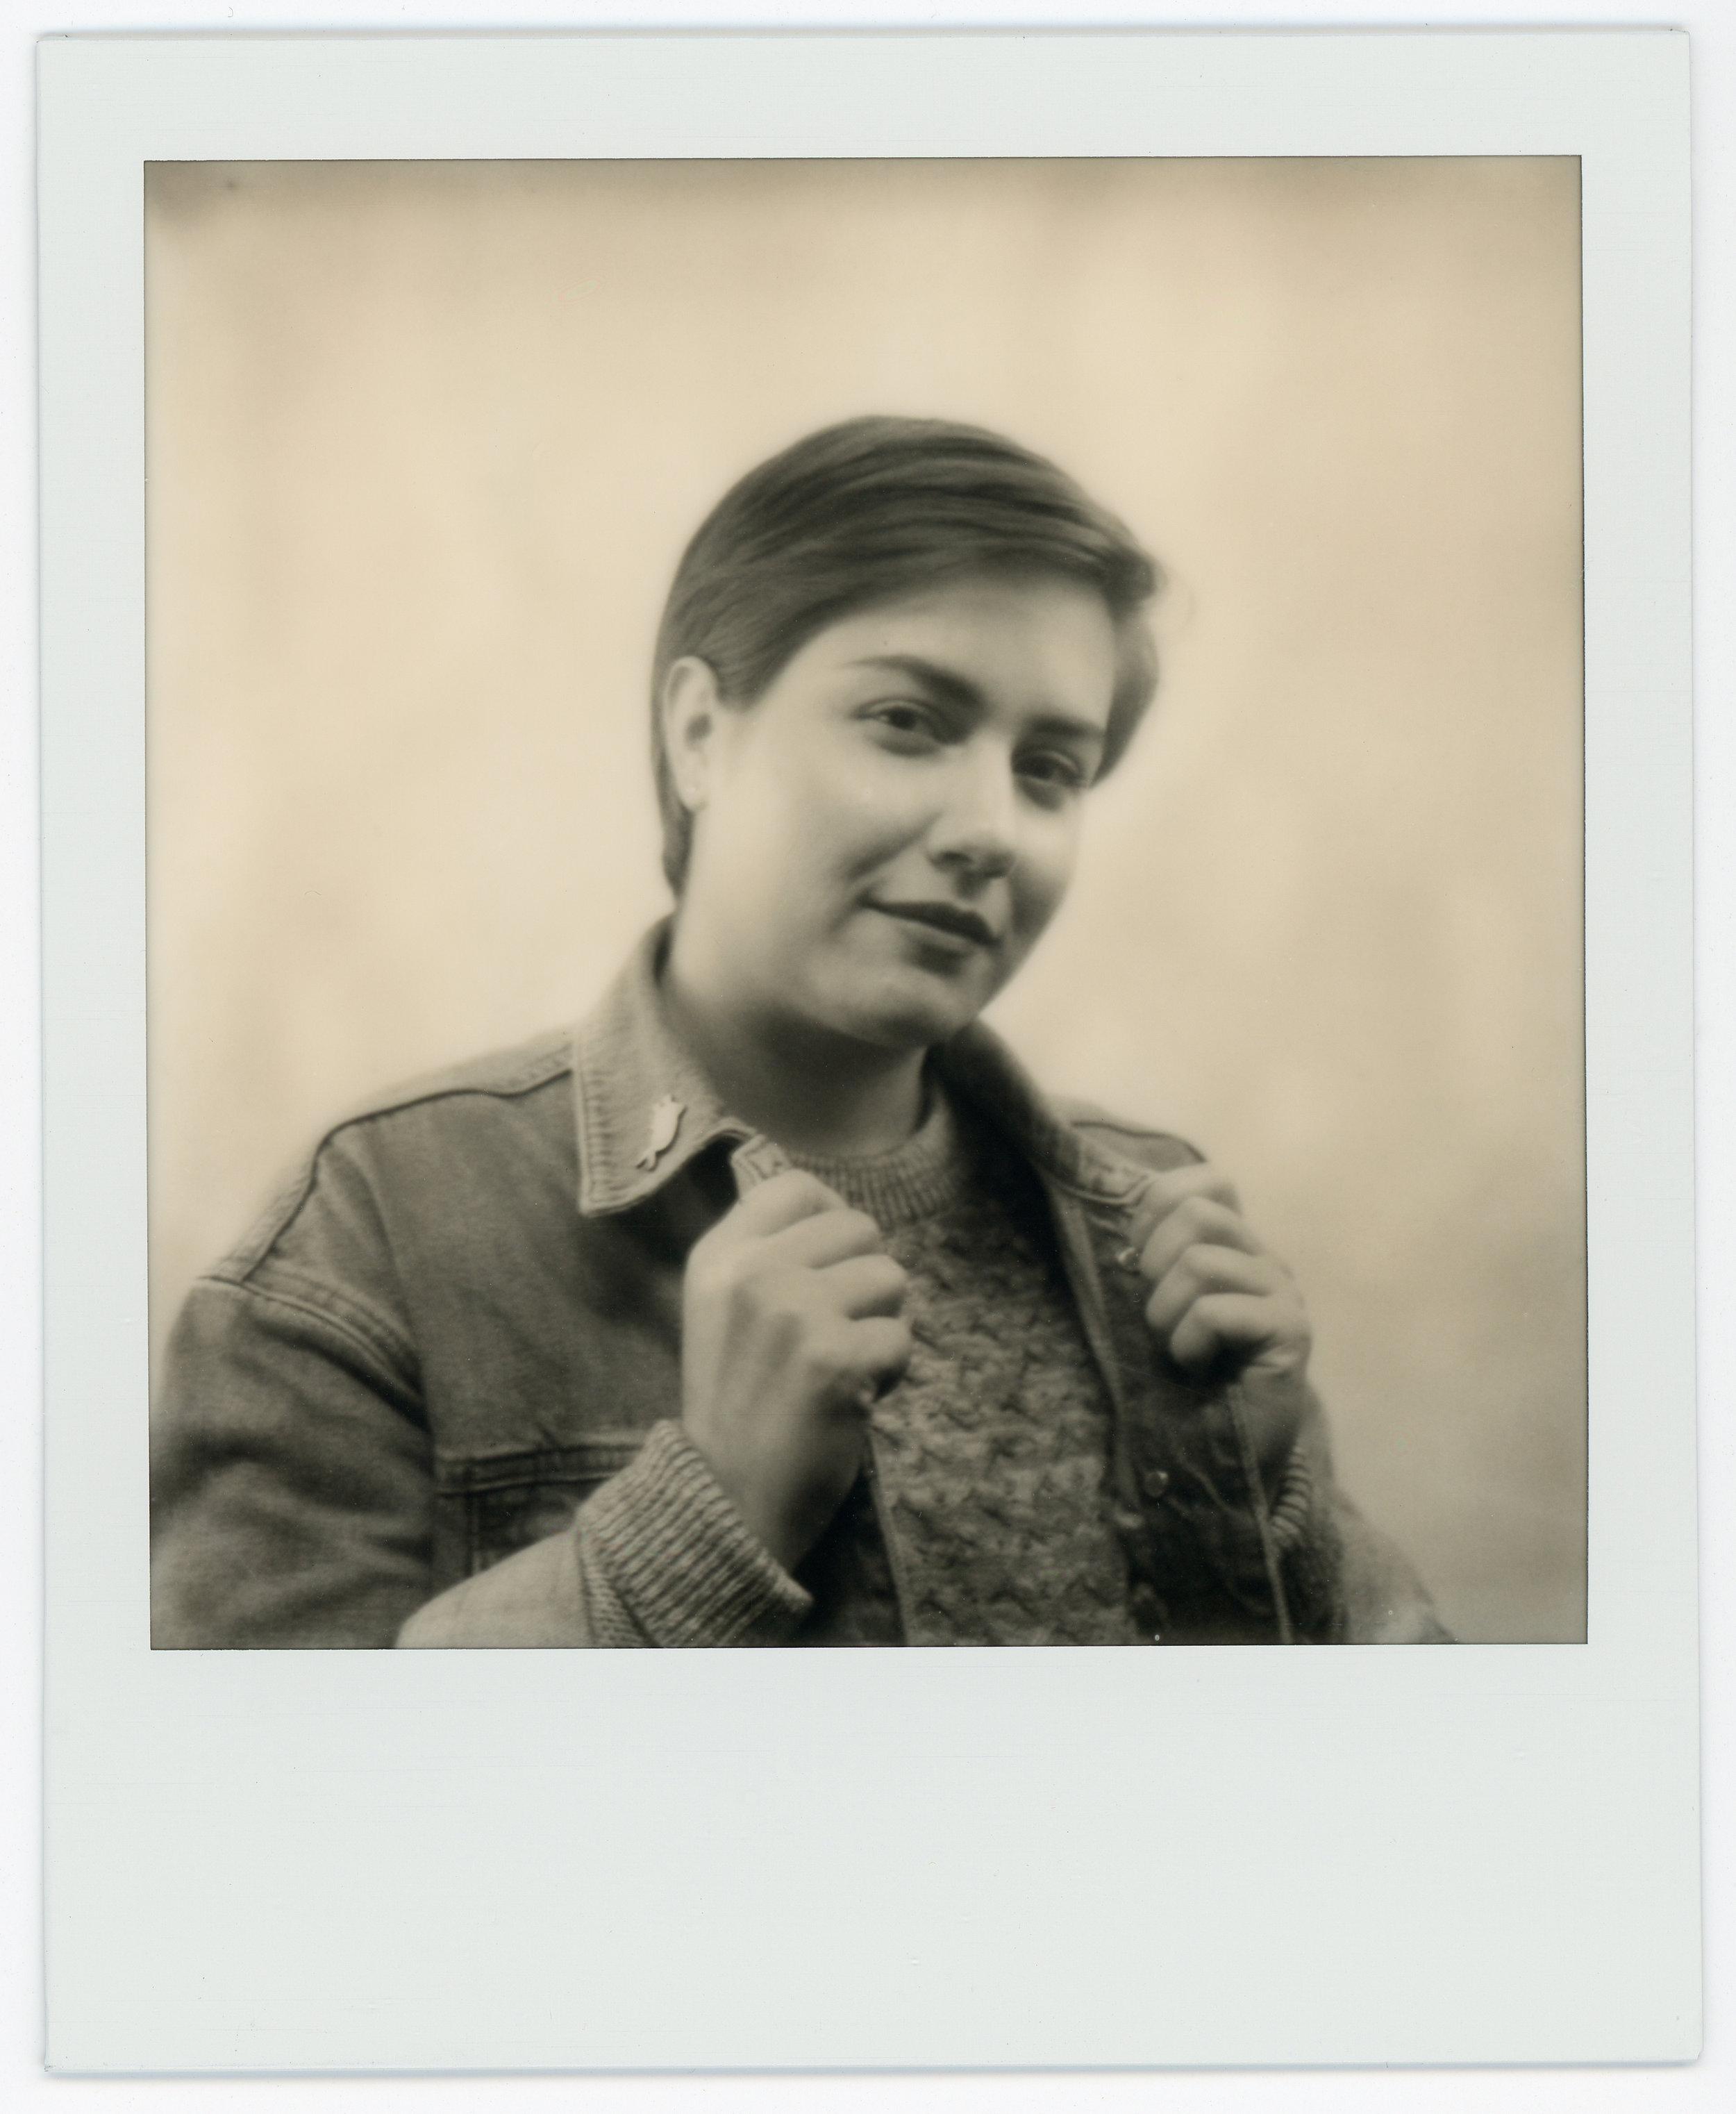 Lauren Klinkhammer